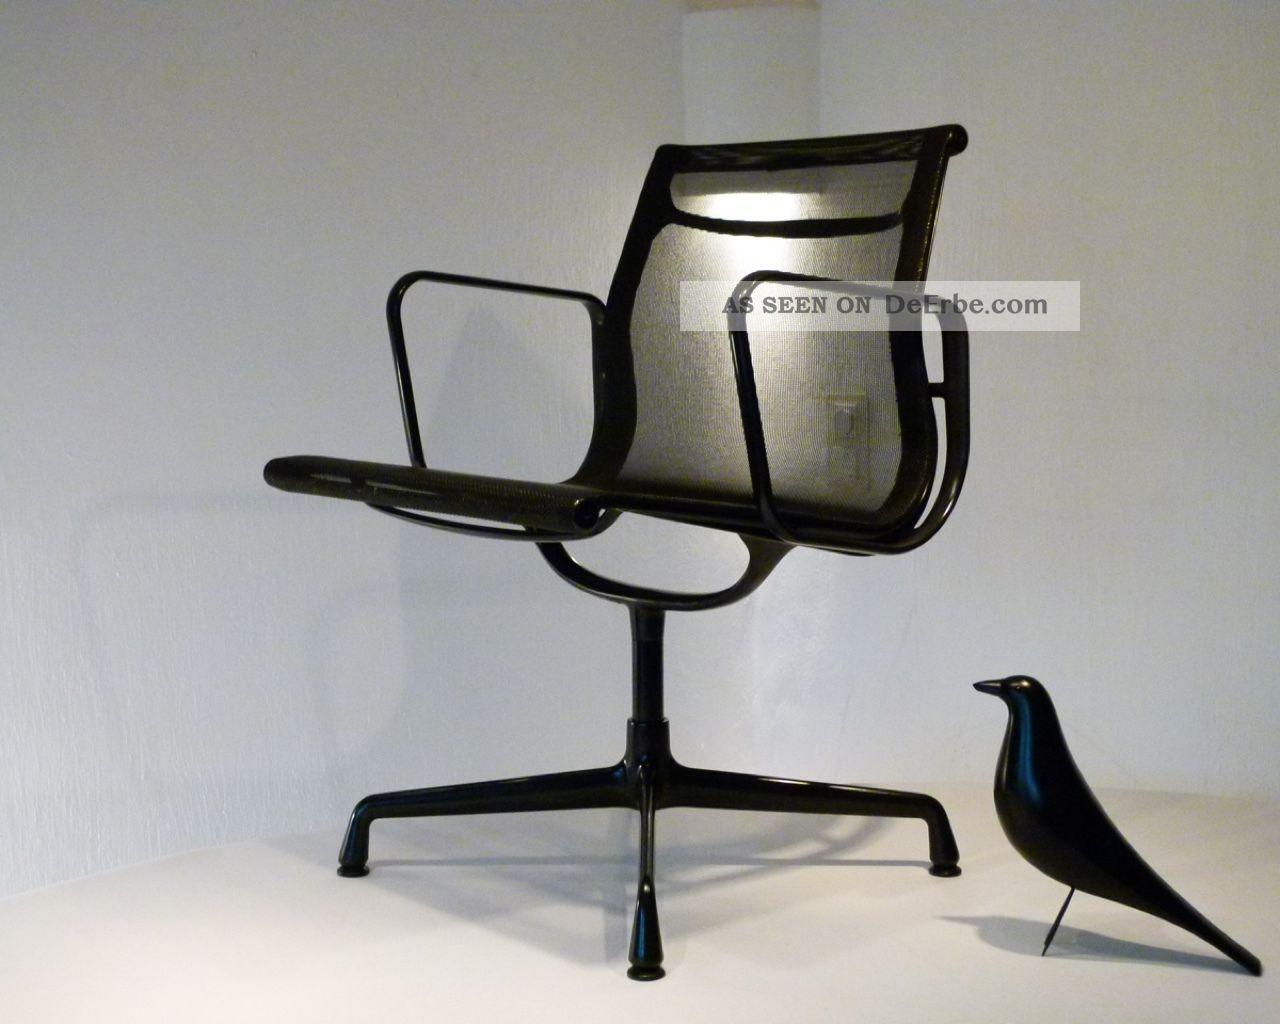 orig vitra charles eames alu chair ea 108 herman miller designklassiker. Black Bedroom Furniture Sets. Home Design Ideas